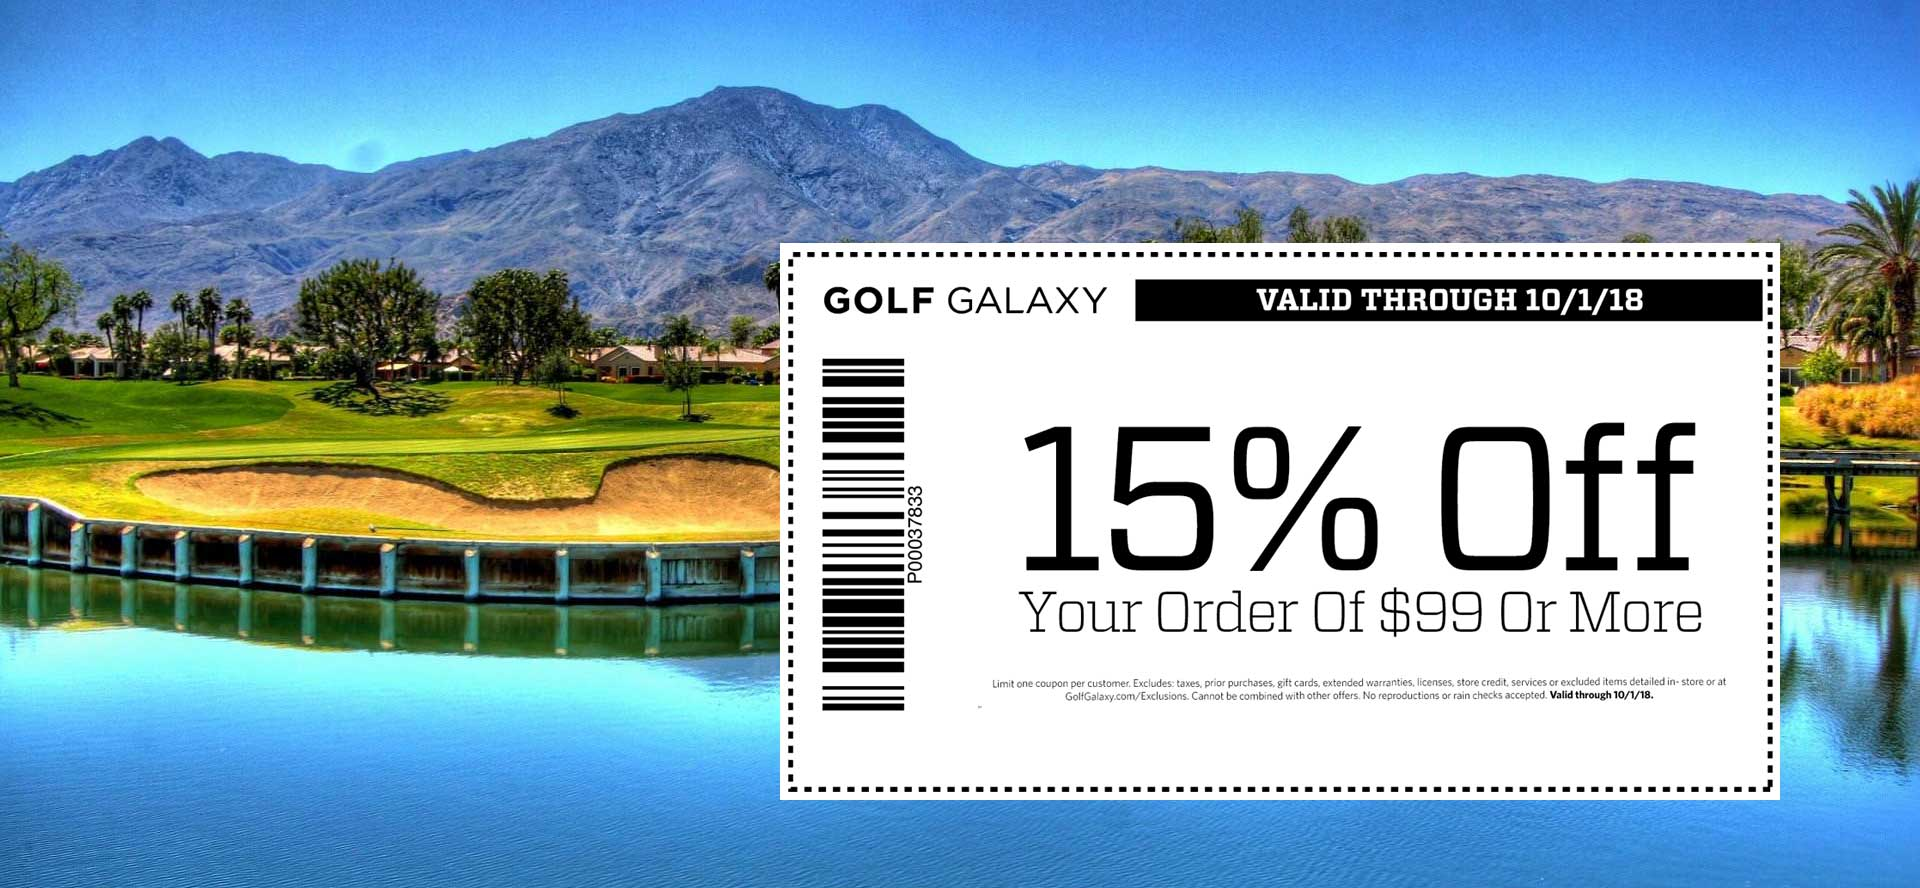 Golf Galaxy Coupon February 2020 15% off $99 at Golf Galaxy